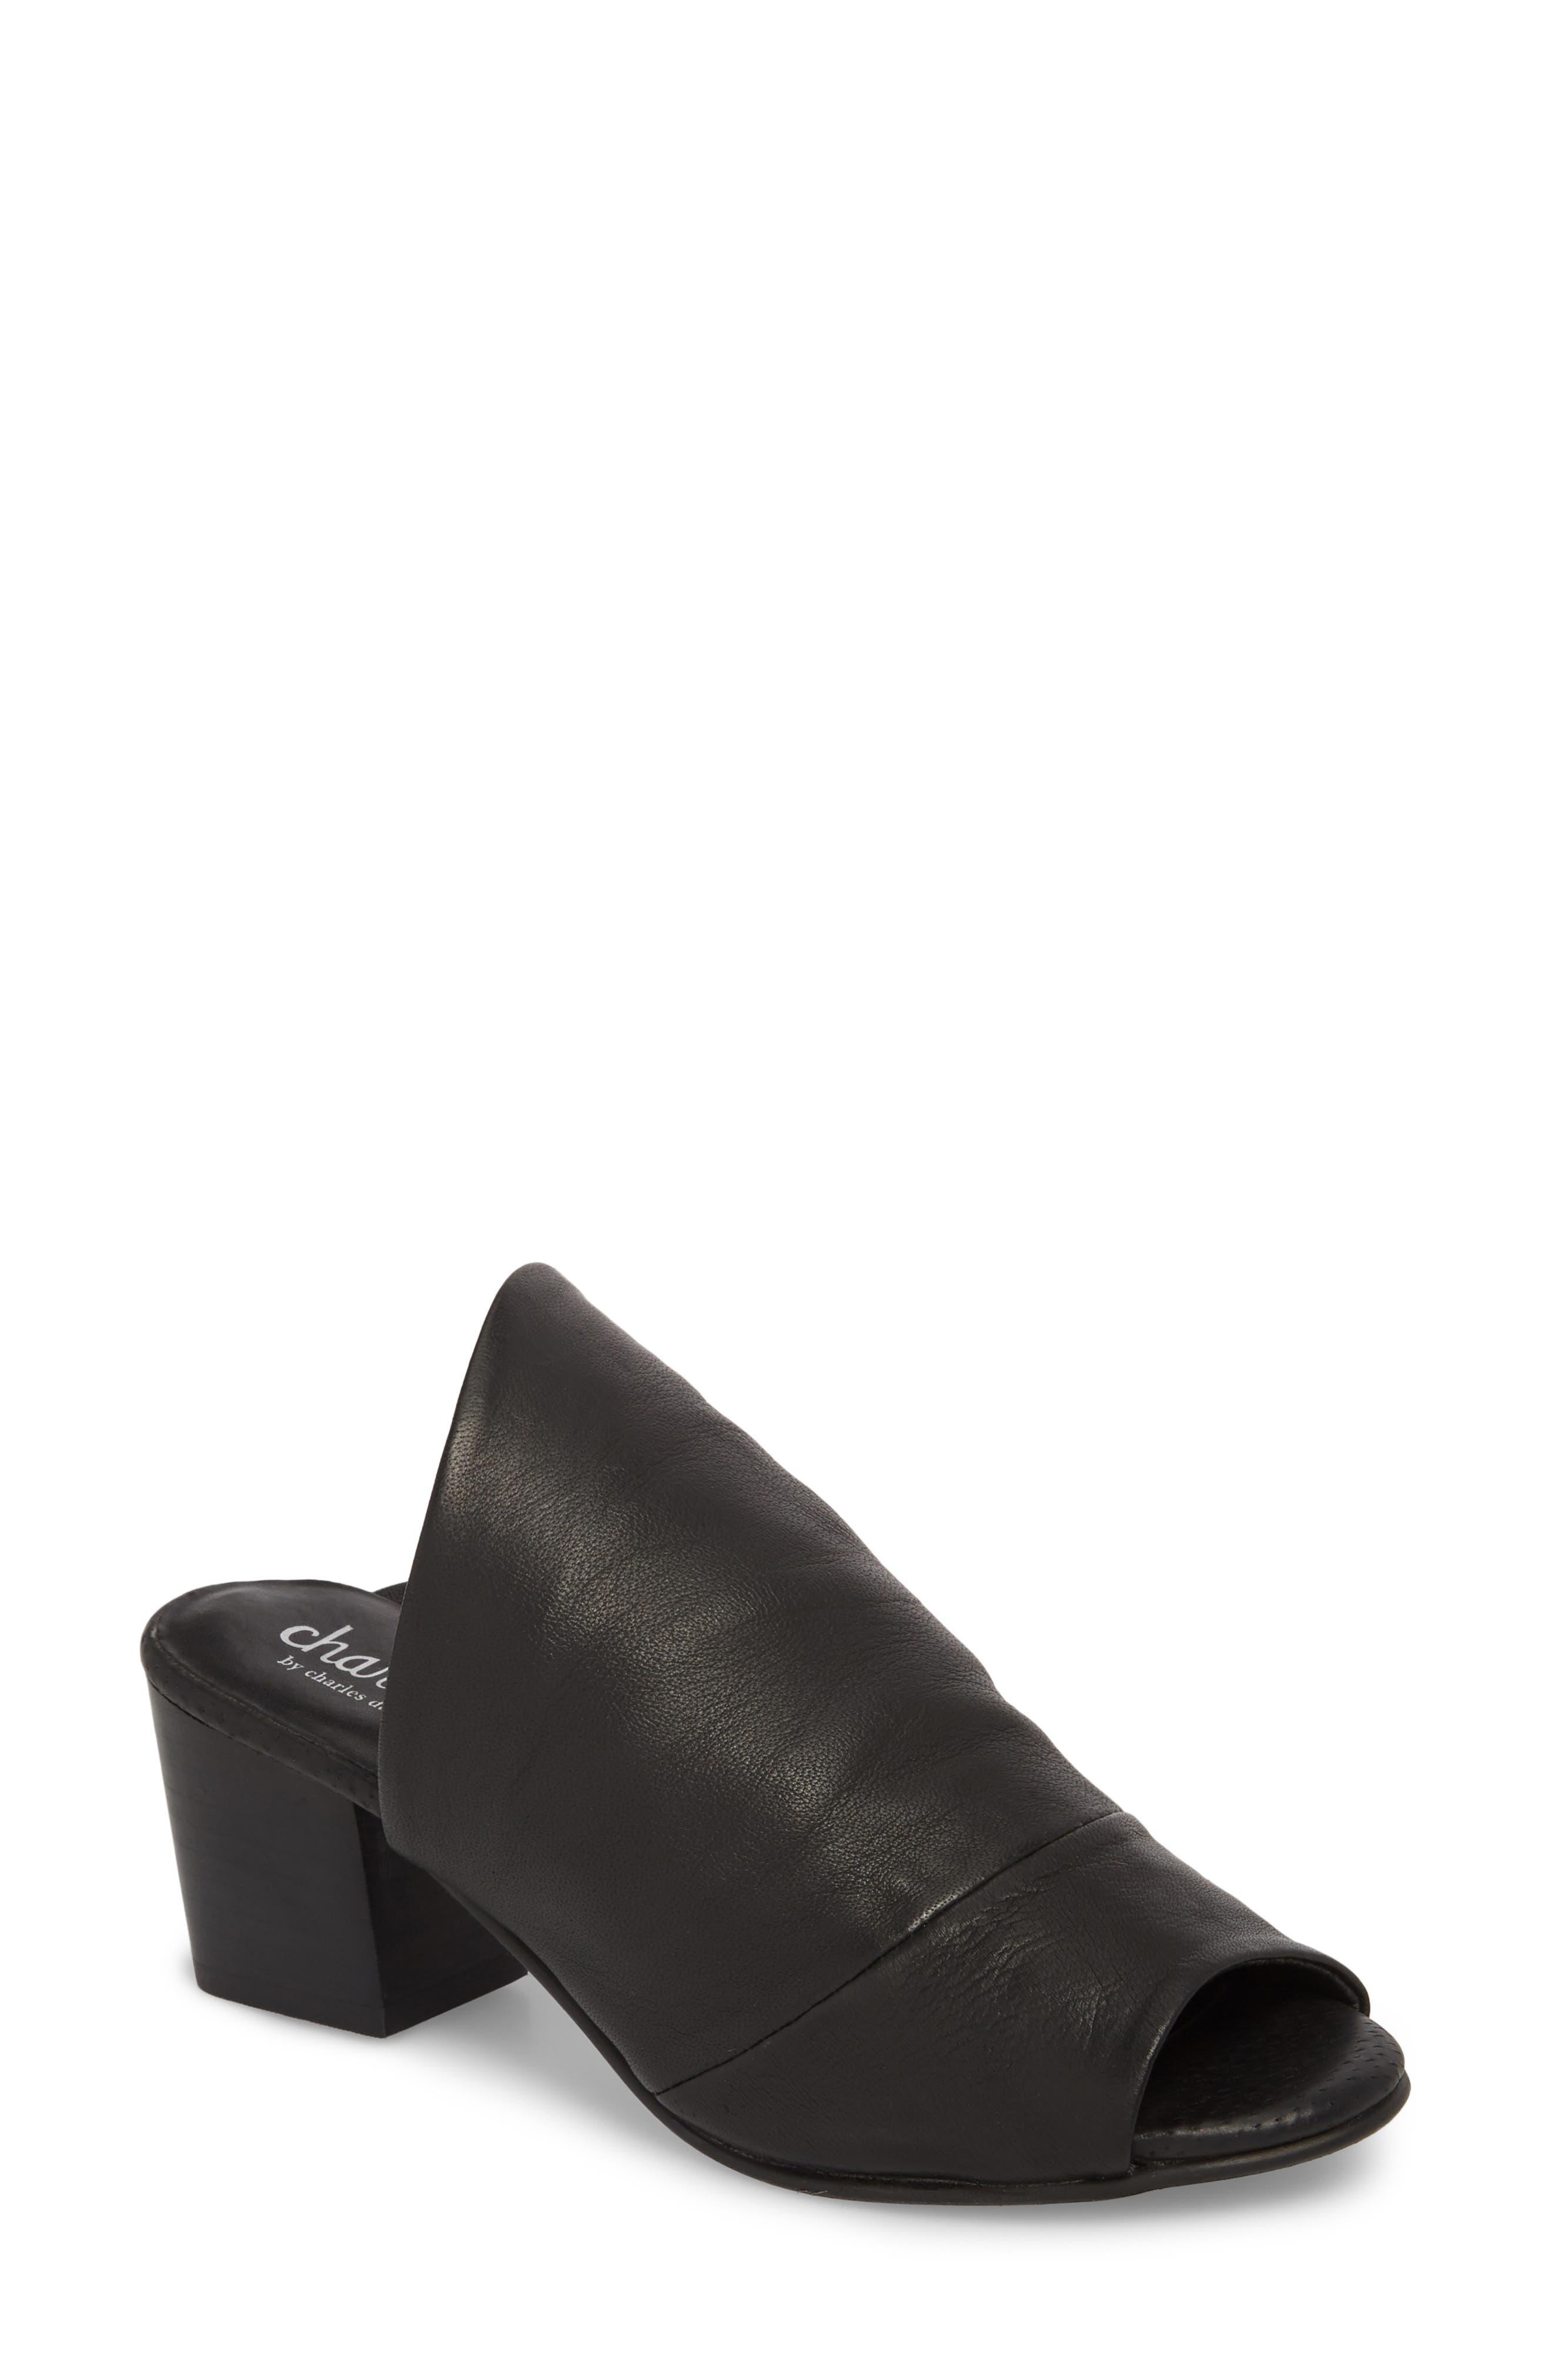 Charles By Charles David Yanna Block Heel Slide Sandal- Black